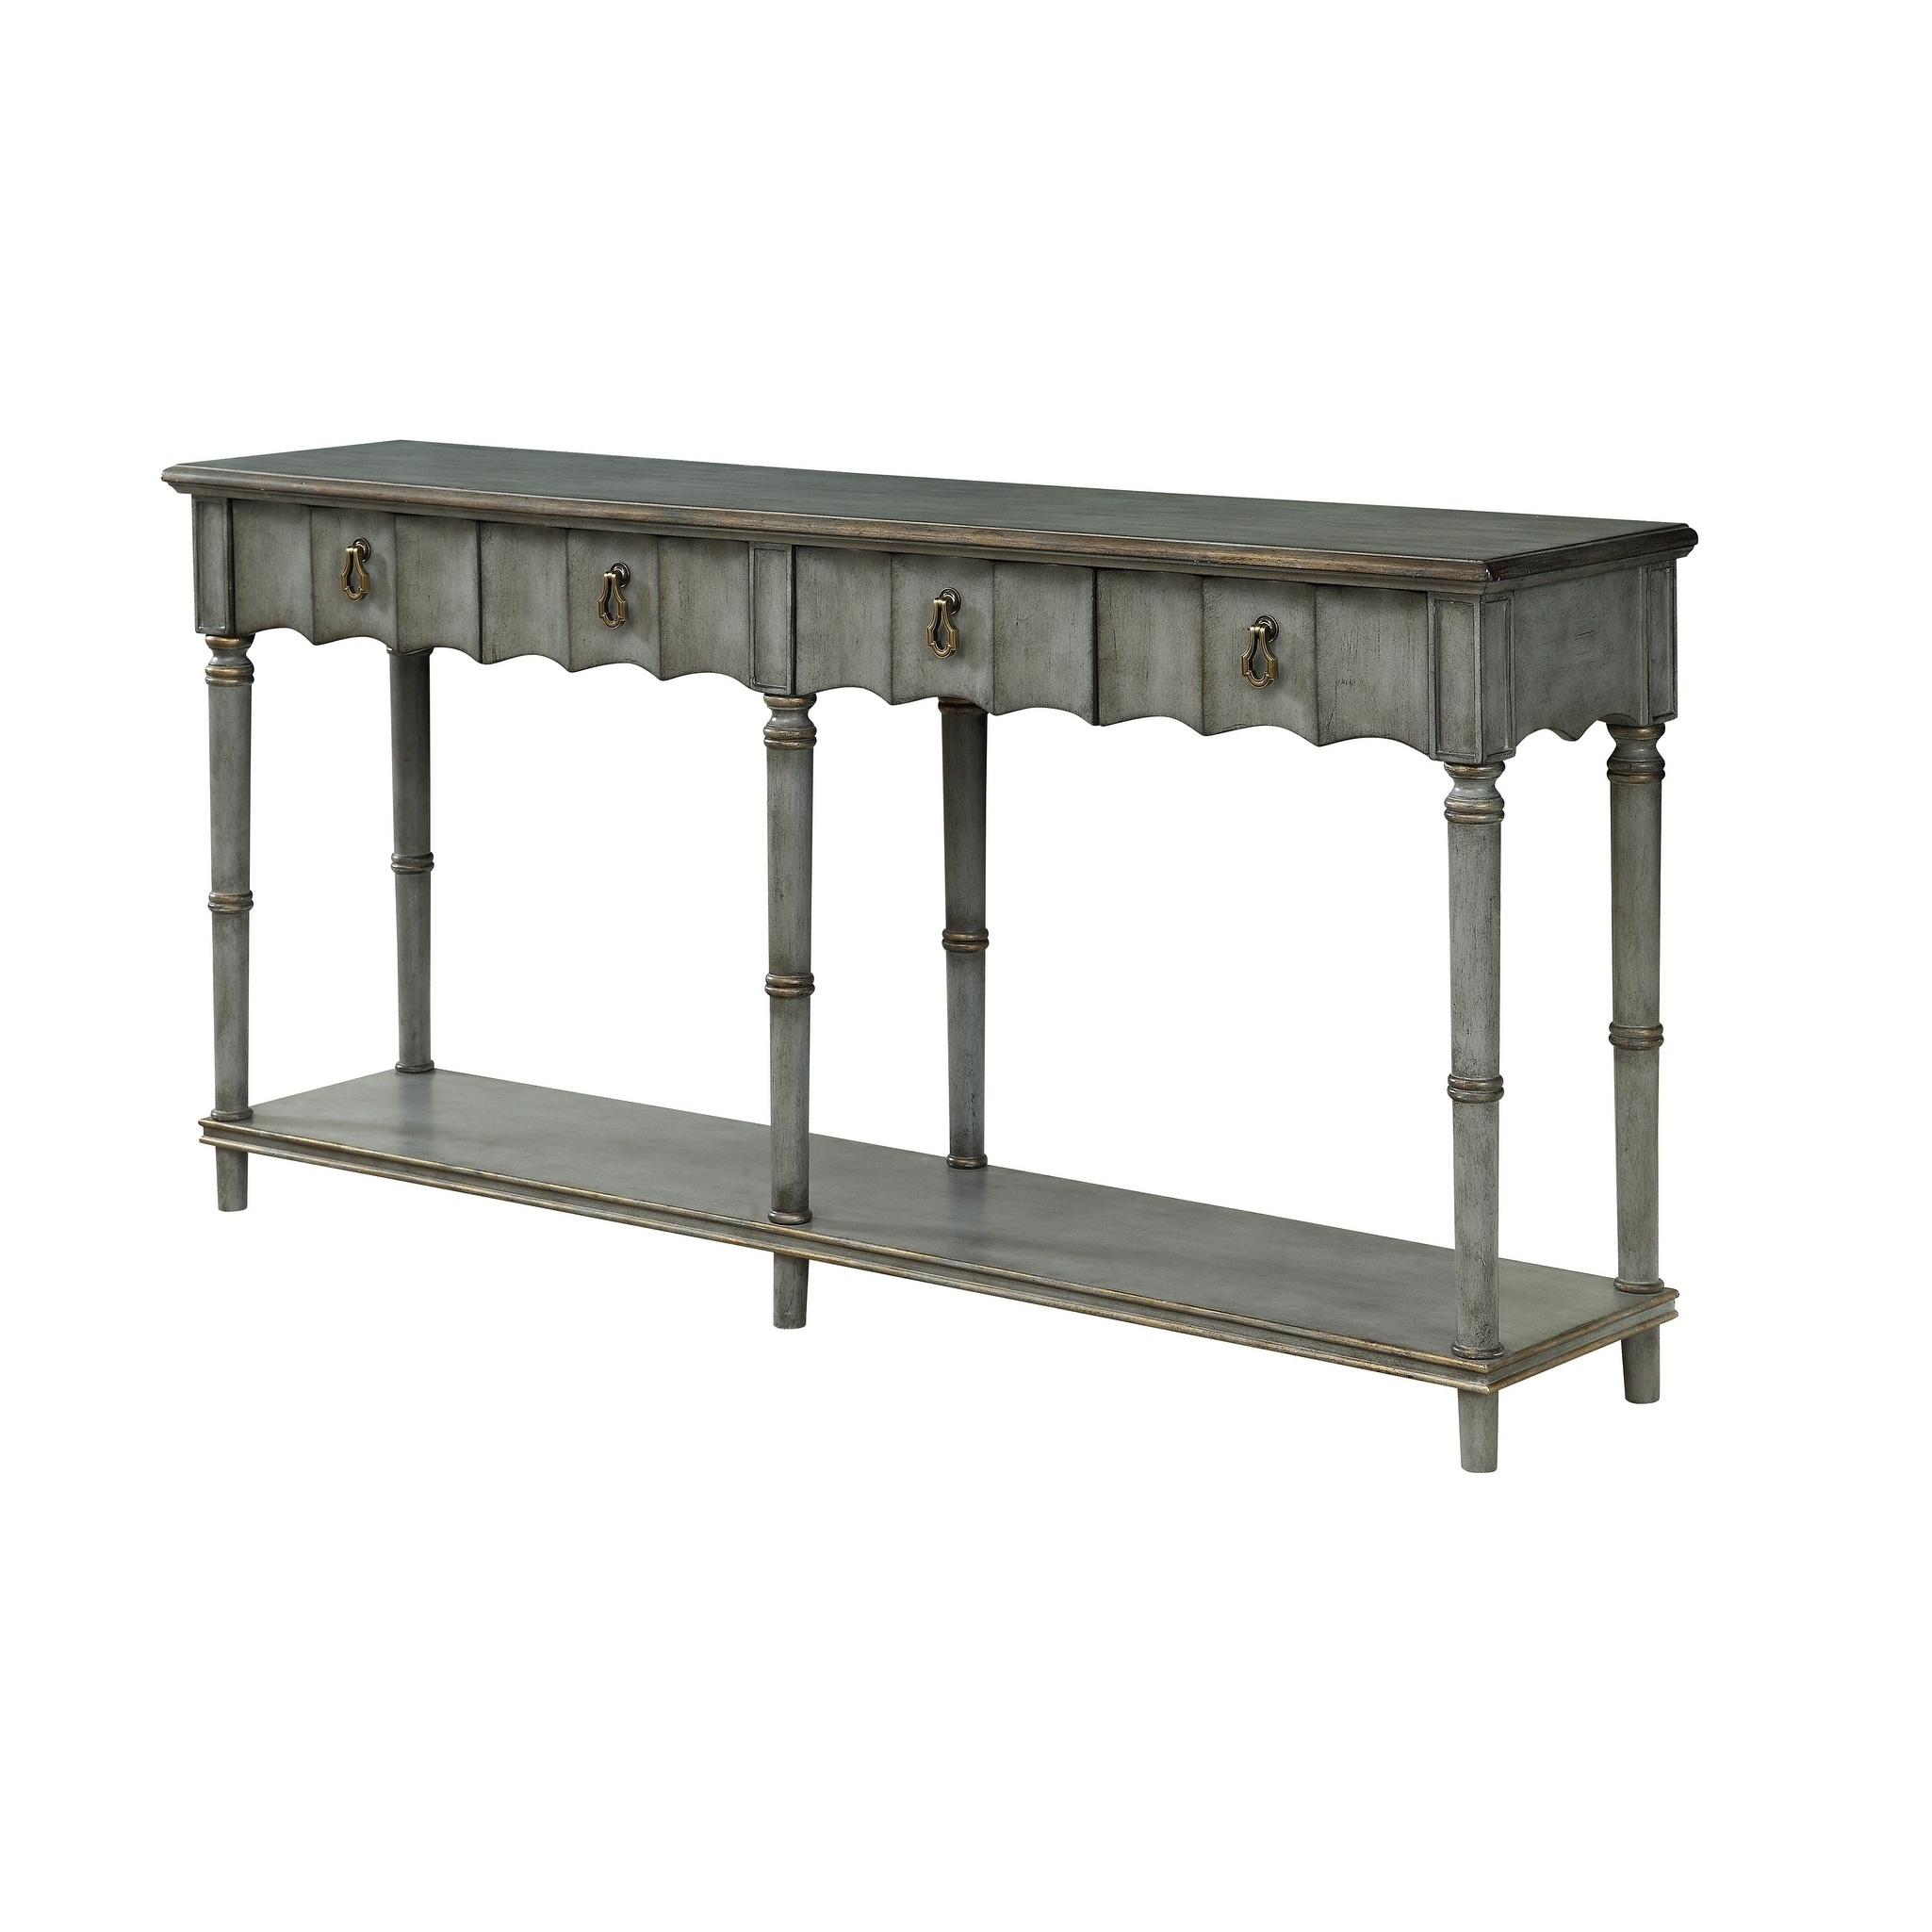 Treasure Trove Mystique Grey and Aged Copper 2-drawer Console Table